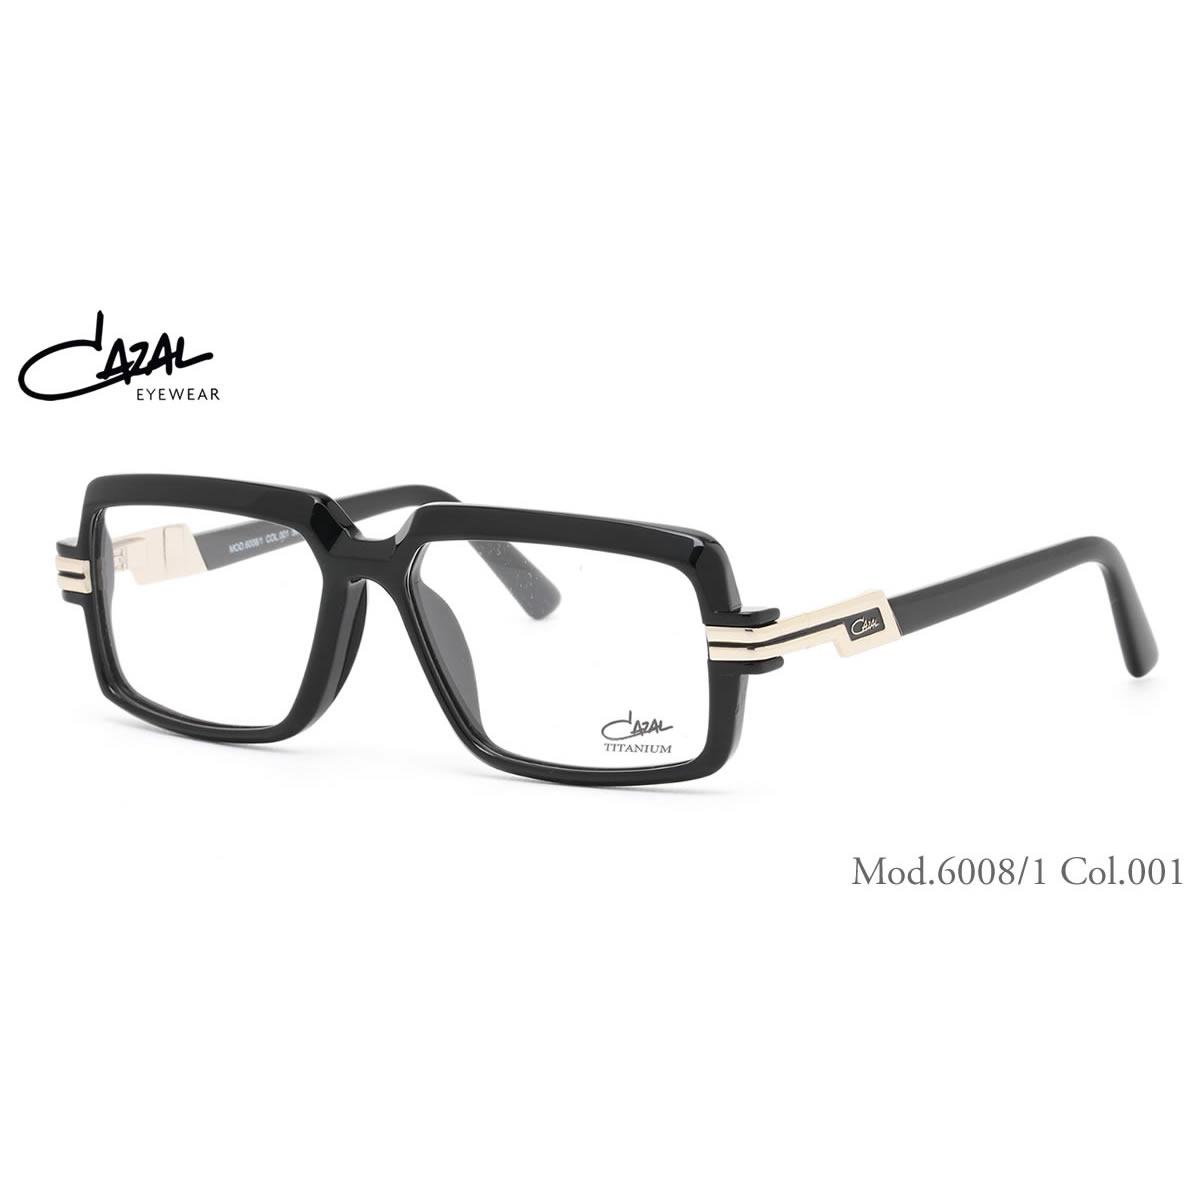 CAZAL カザール メガネ 6008/1 001 56サイズ CAZAL 伊達メガネレンズ無料 メンズ レディース